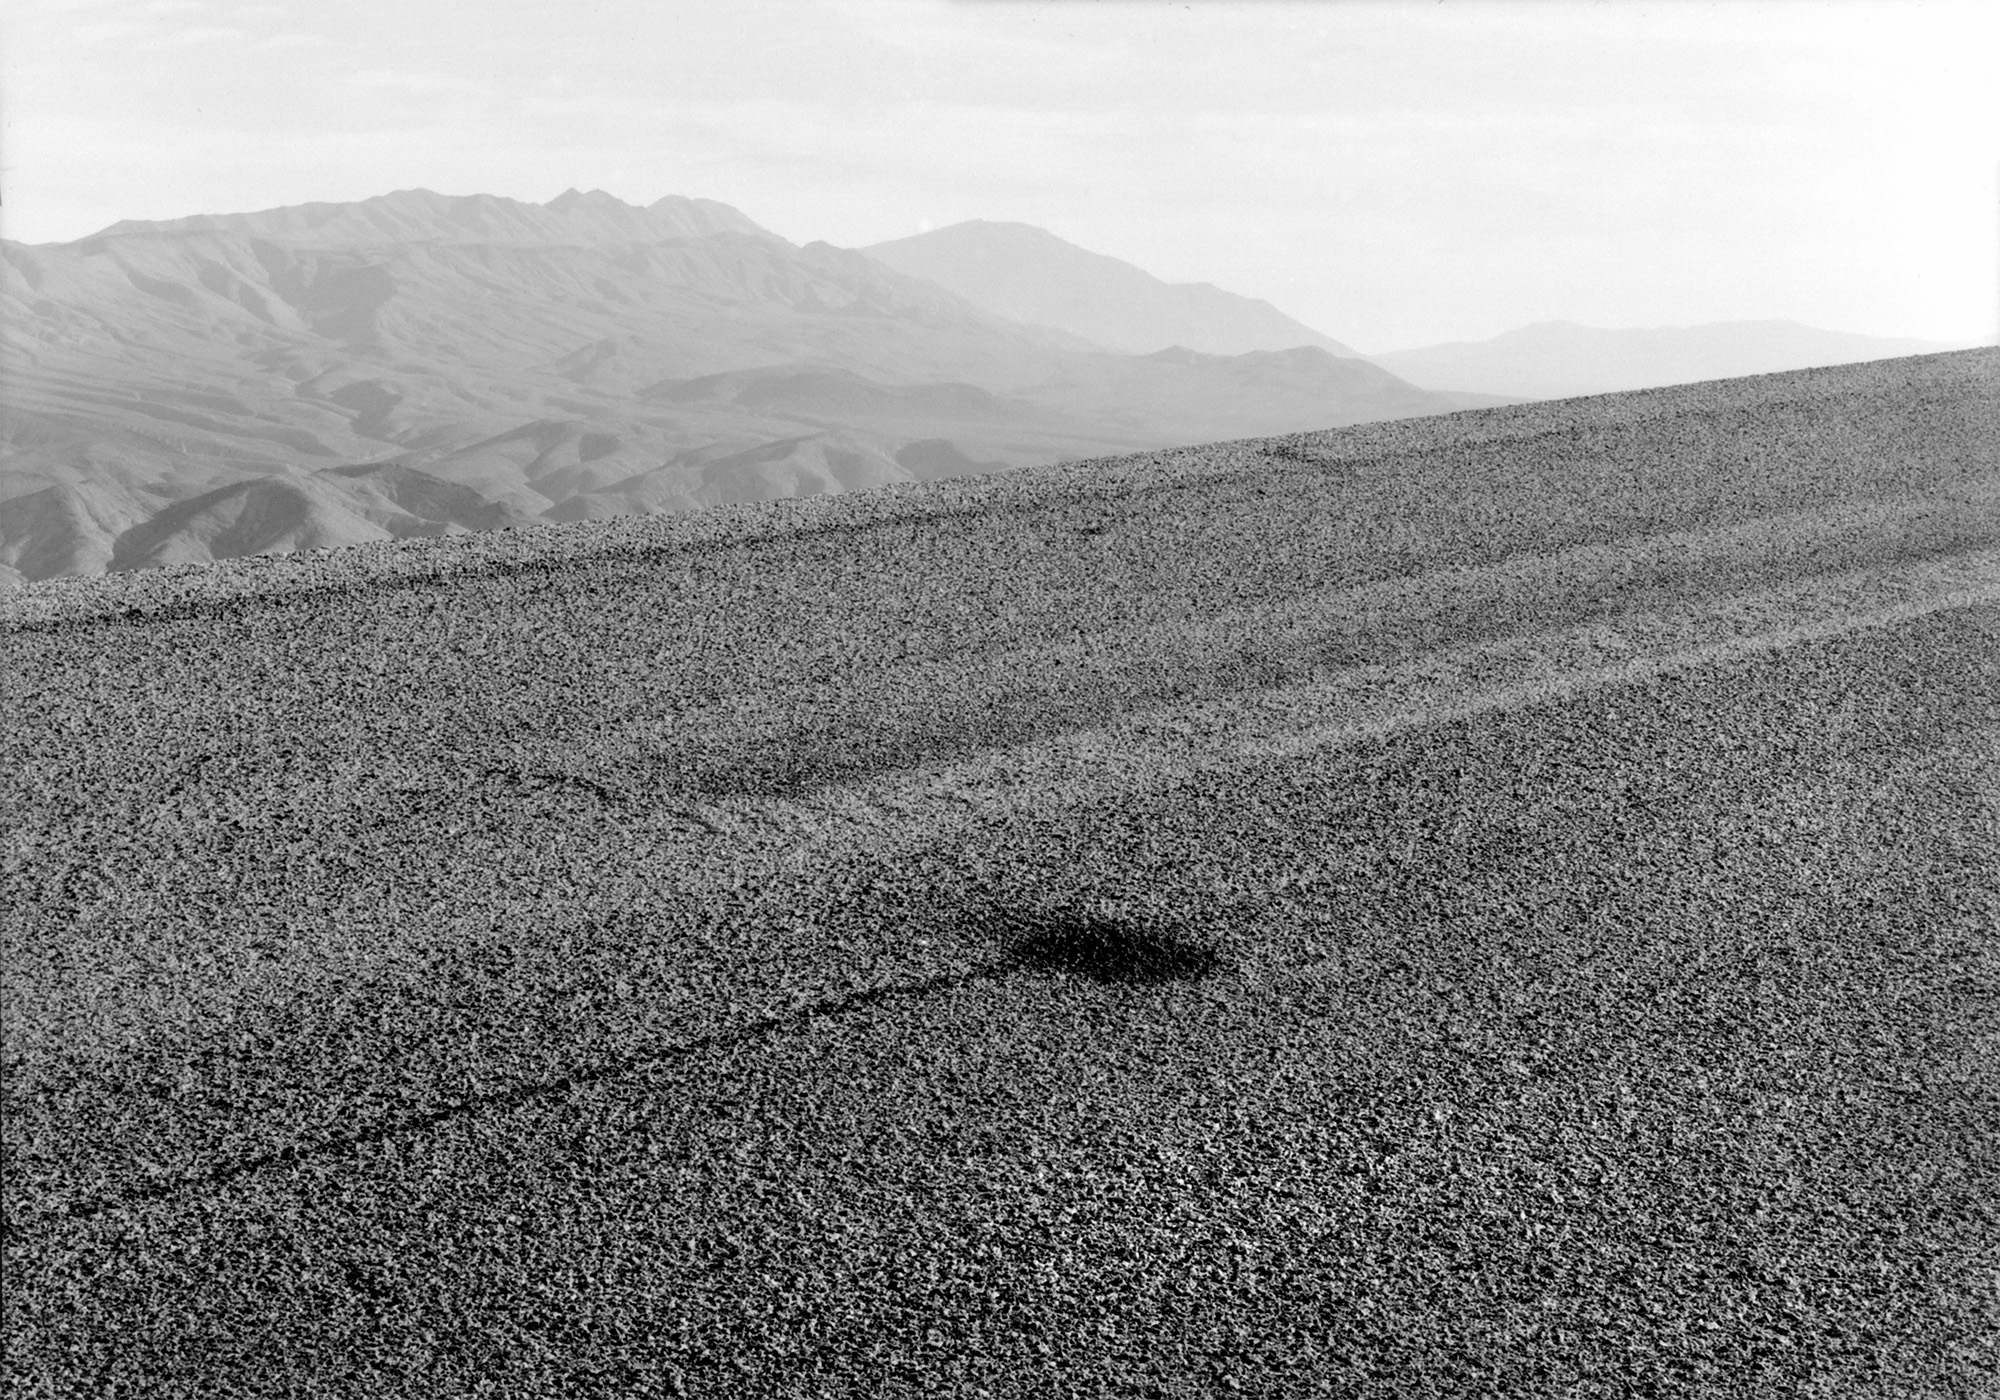 Panamint Range, California, 1981